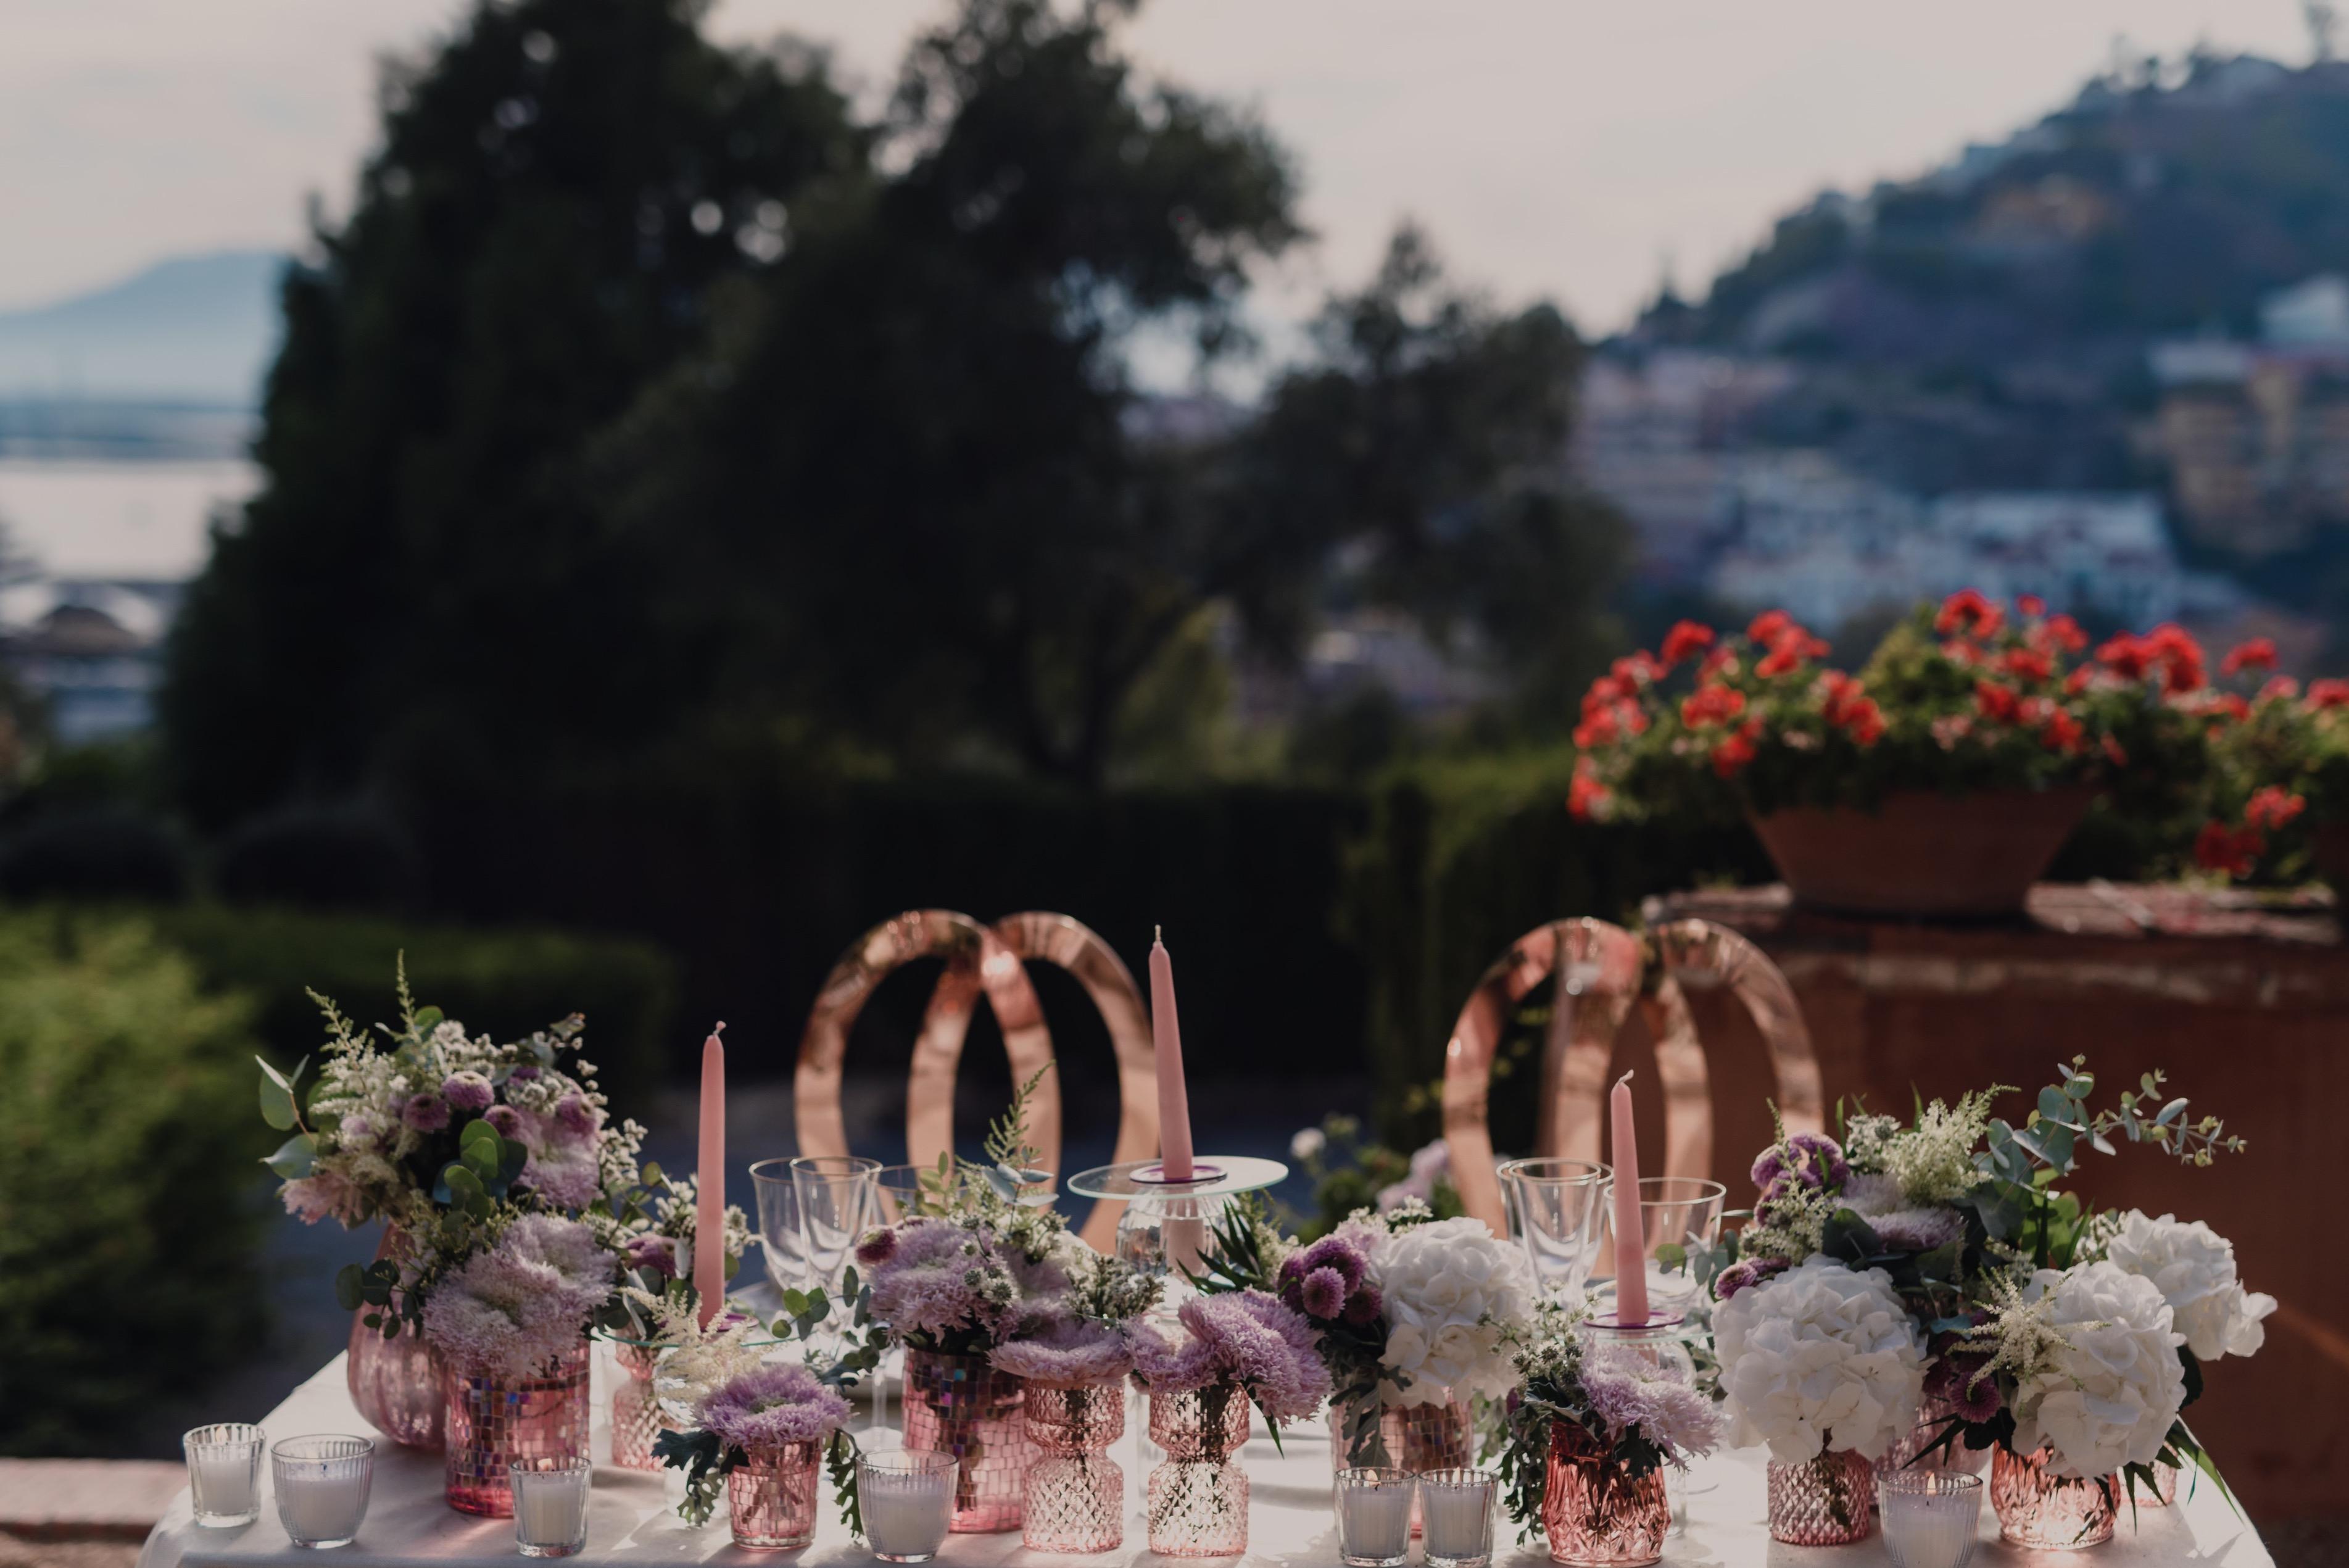 Si-Quiero-Wedding-Planner-By-Sira-Antequera-Bodas-Málaga-Marbella-Miami- Vanesa-Avelinaok-1